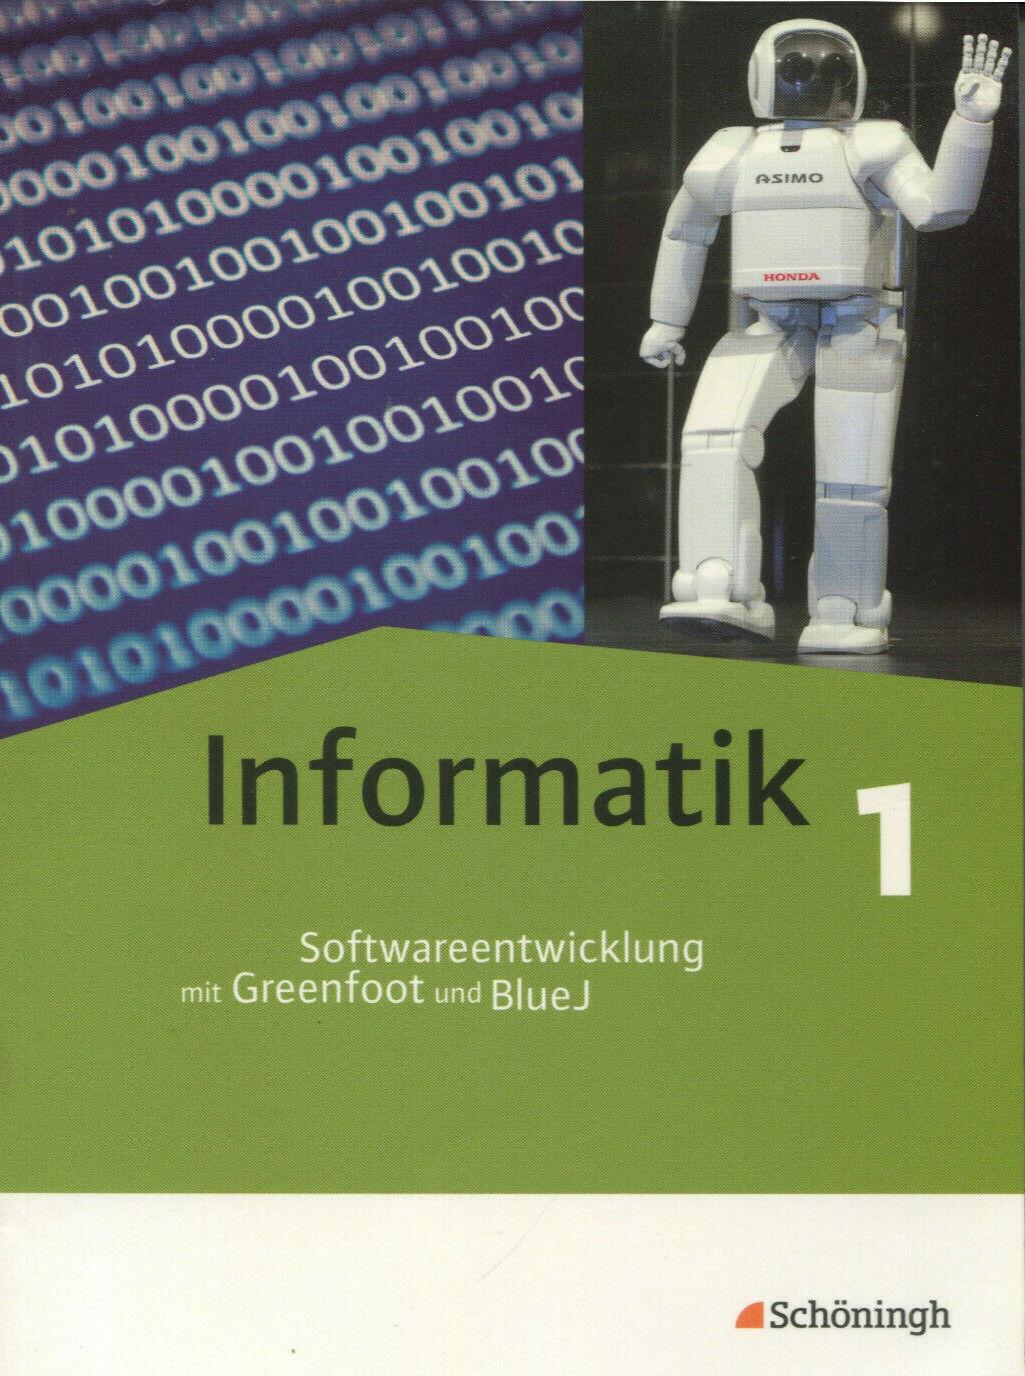 Informatik - Band1 - Softwareentwicklung mit Greenfoot und BlueJ incl. CD-ROM - Thomas Kempe und David Tepaße